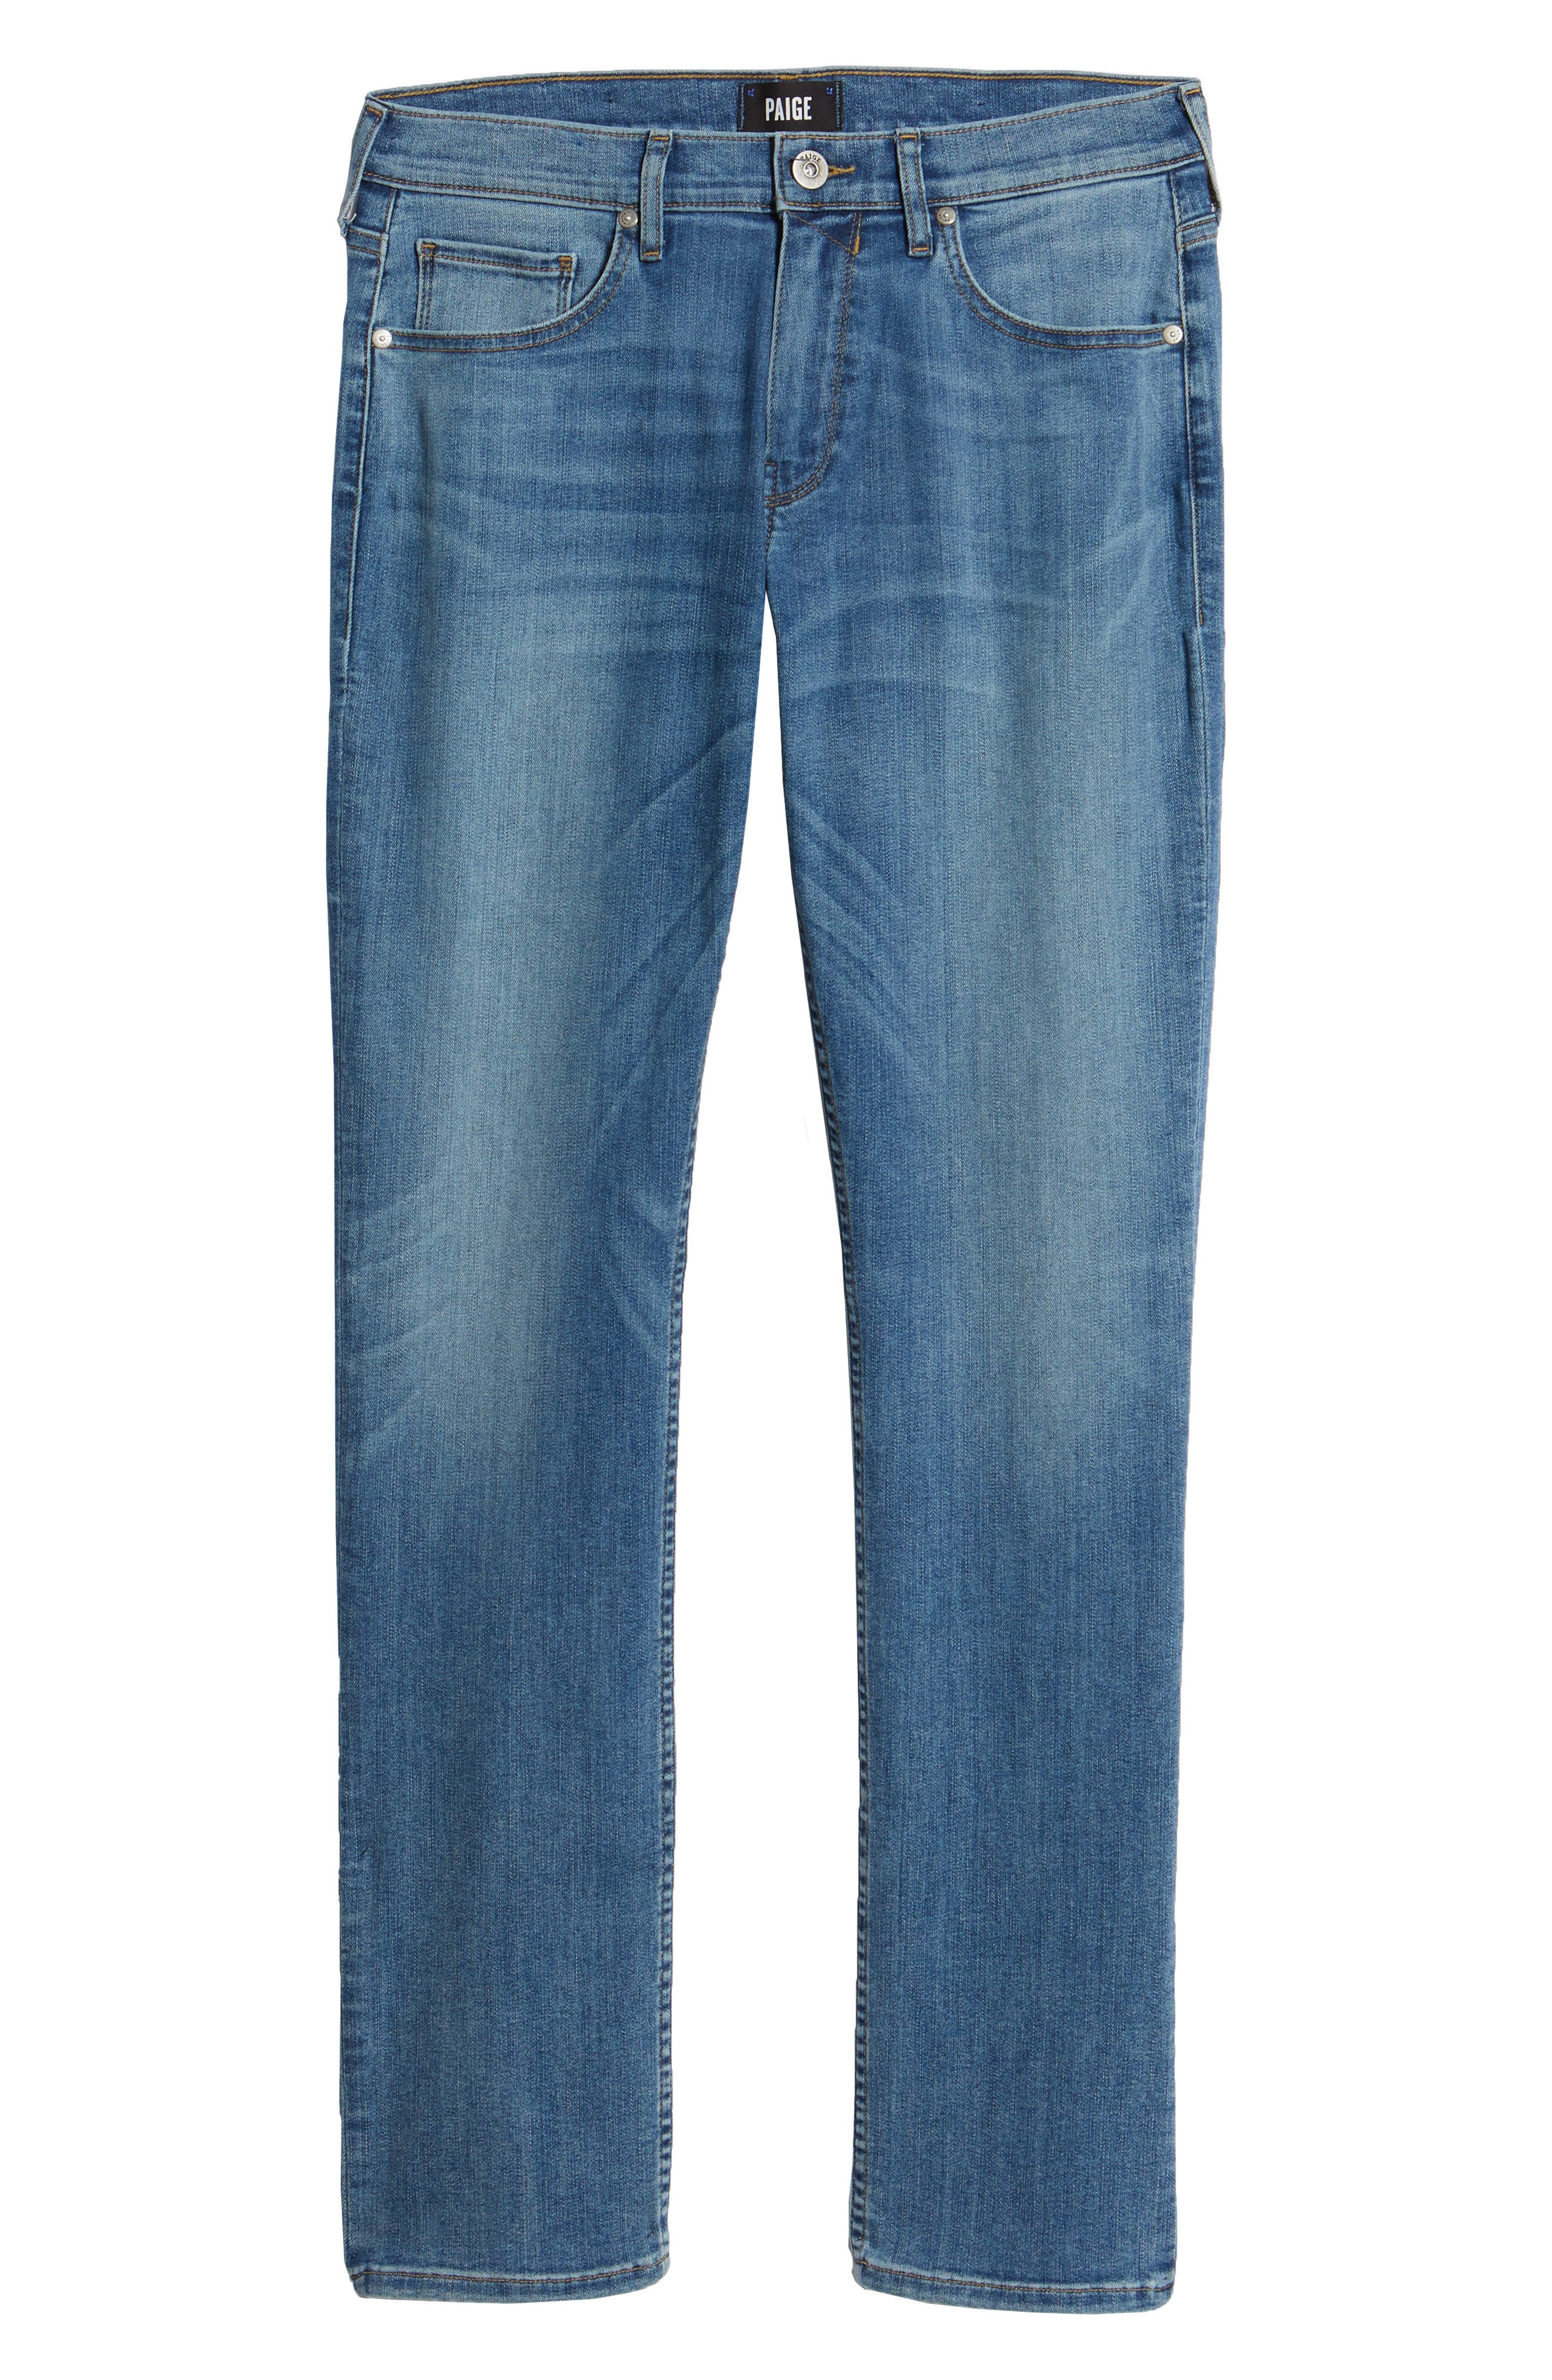 Federal Slim Straight Leg Jeans,                             Alternate thumbnail 6, color,                             CARTWRIGHT